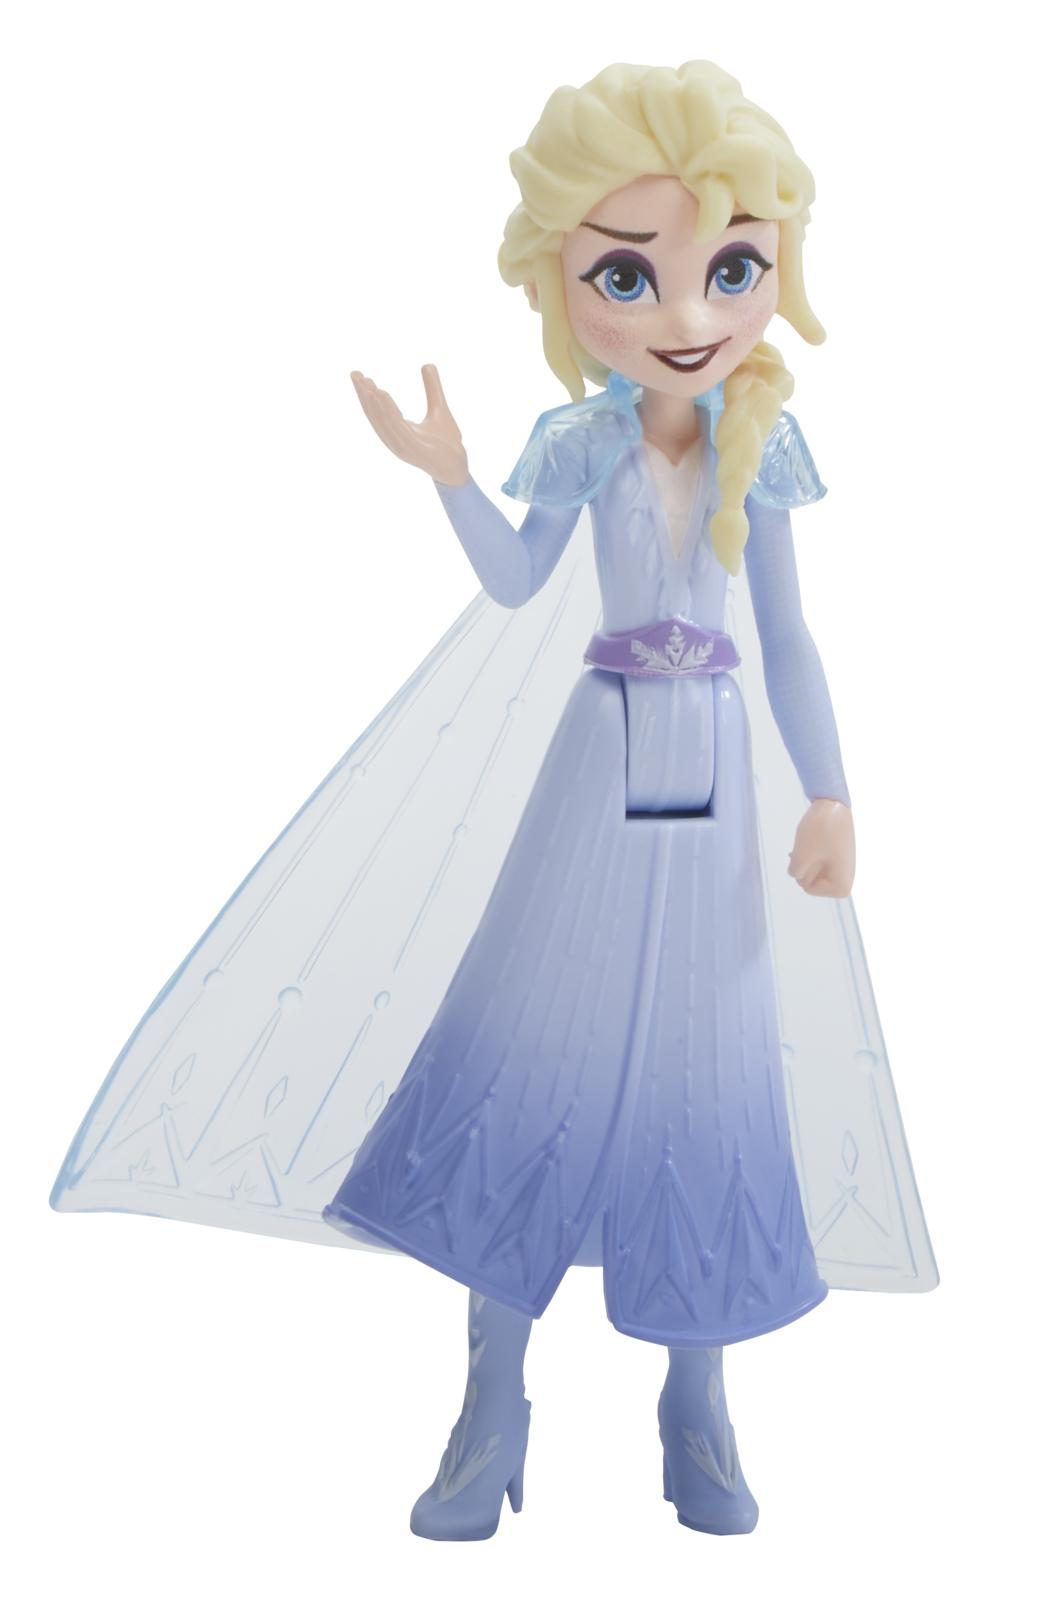 Frozen II: Elsa - Small Doll image